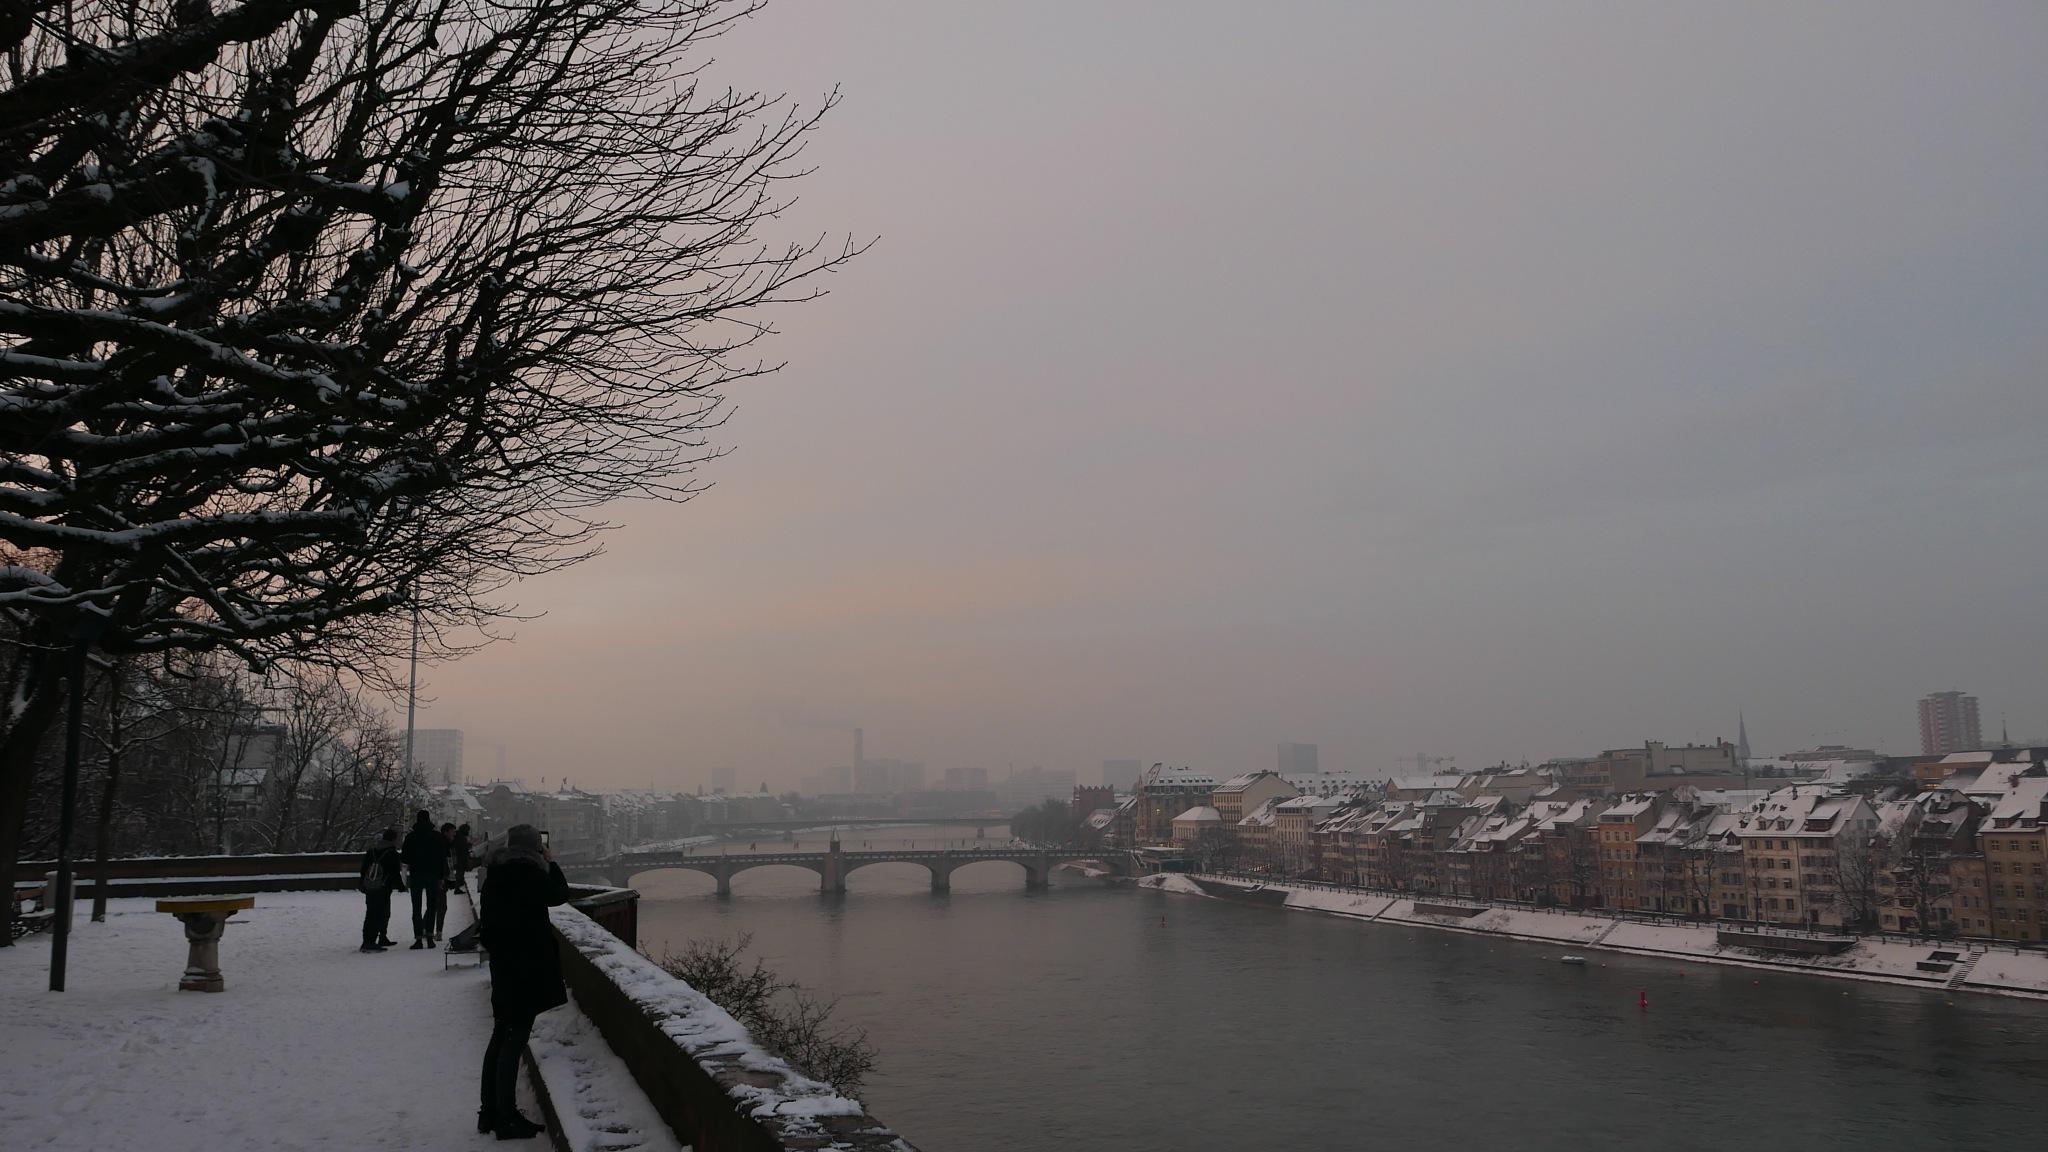 Die Pfalz am Winter. by percy ottinger